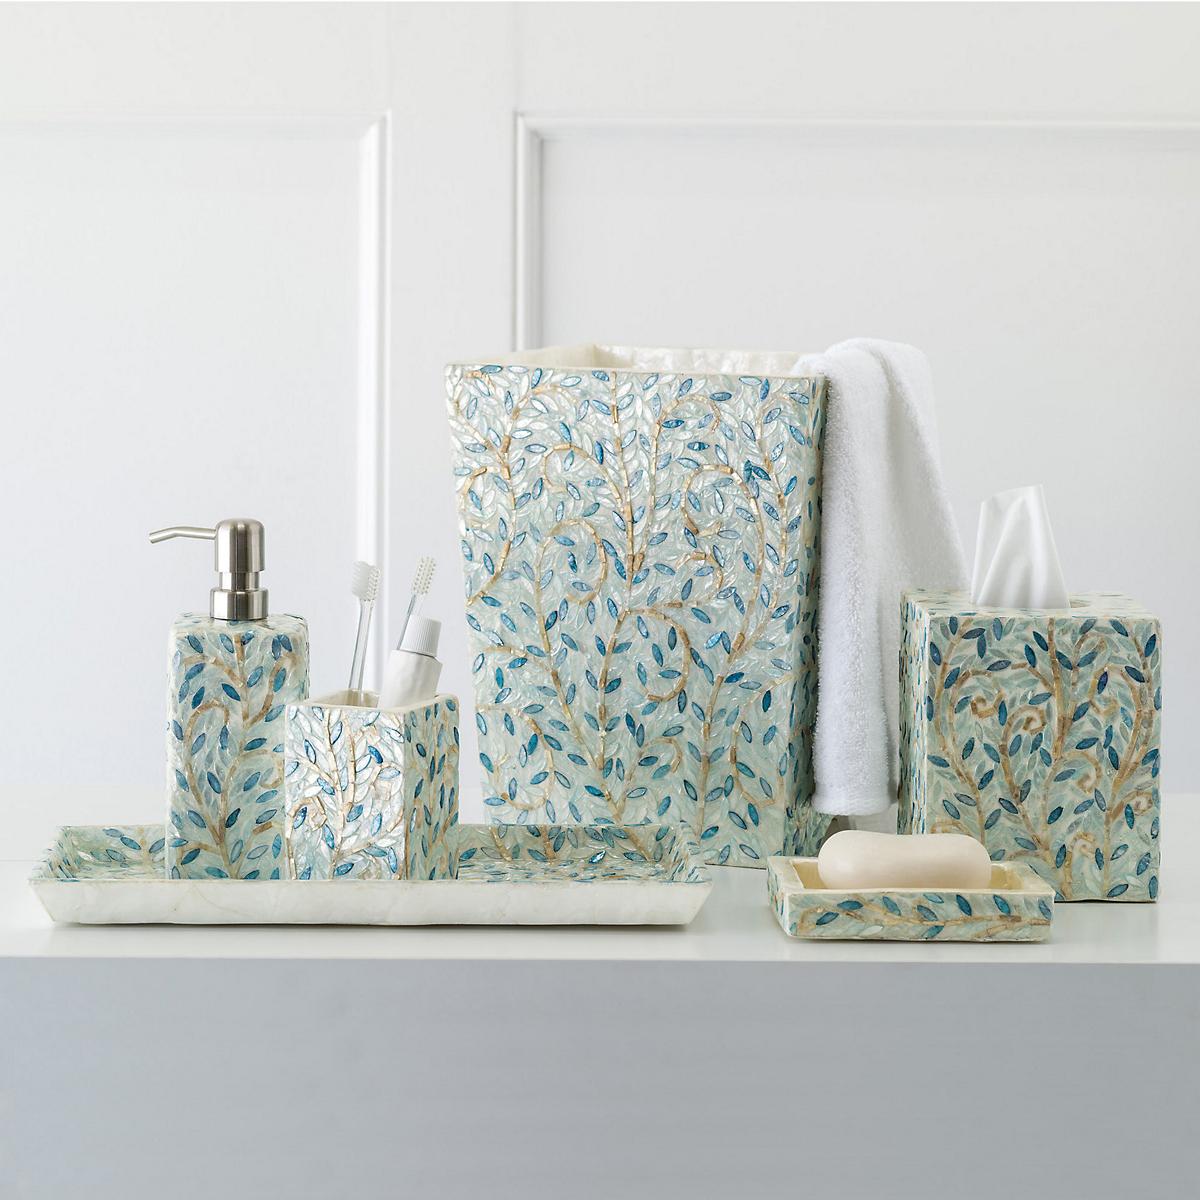 Sorrento capiz shell bath accessories gump 39 s - Capiz shell bathroom accessories ...